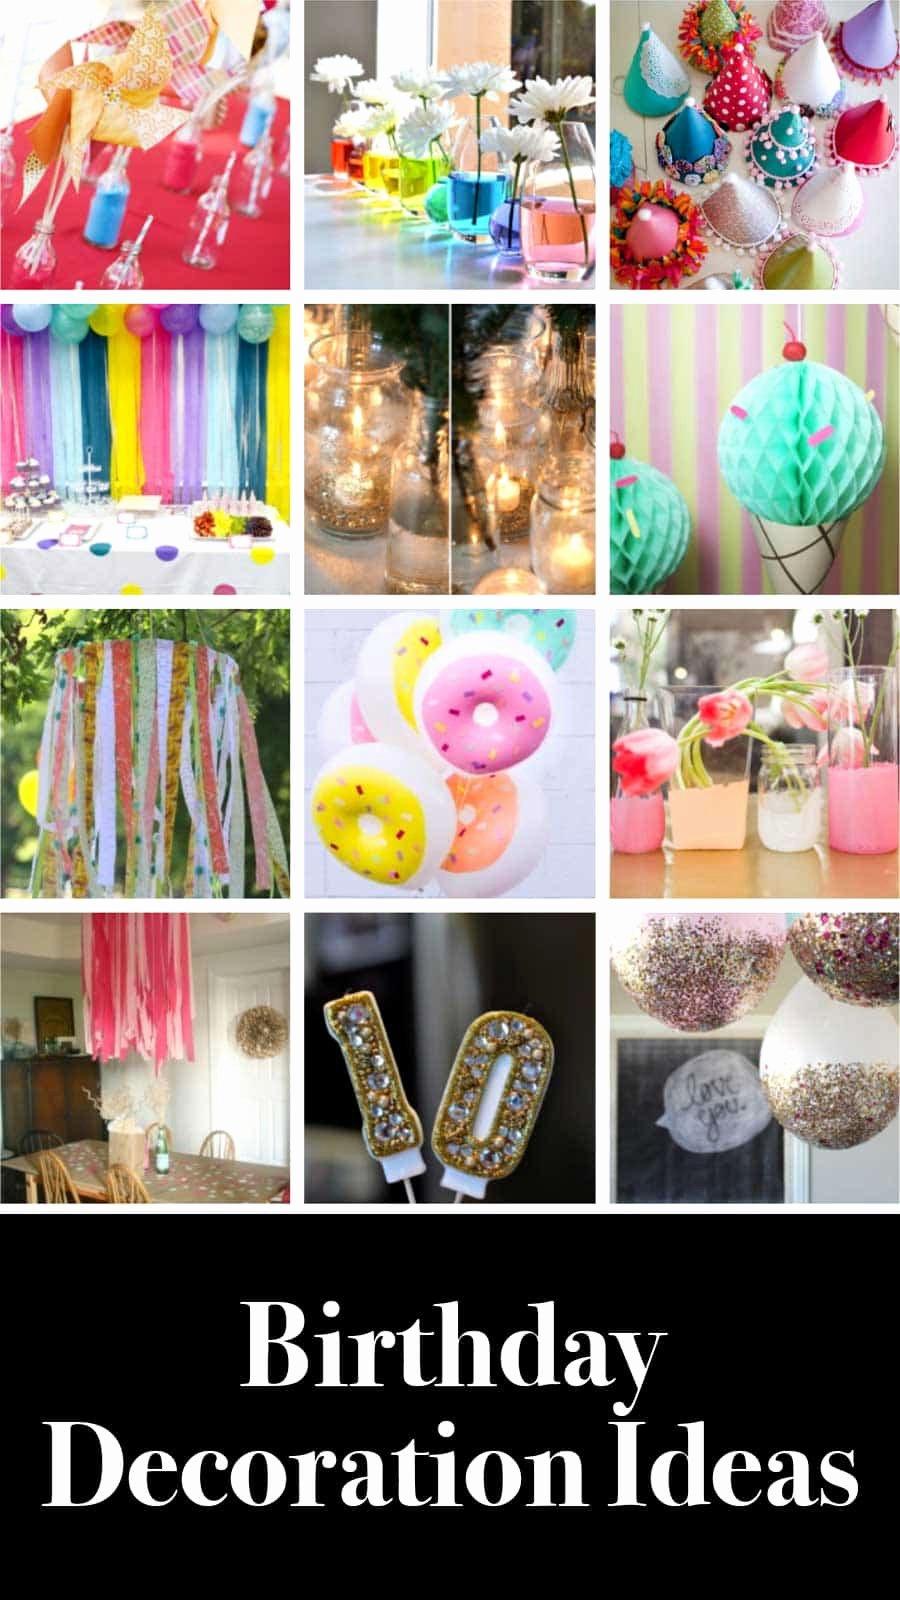 8 Month Birthday Decoration Ideas Luxury 12 Easy Diy Birthday Decoration Ideas 2020